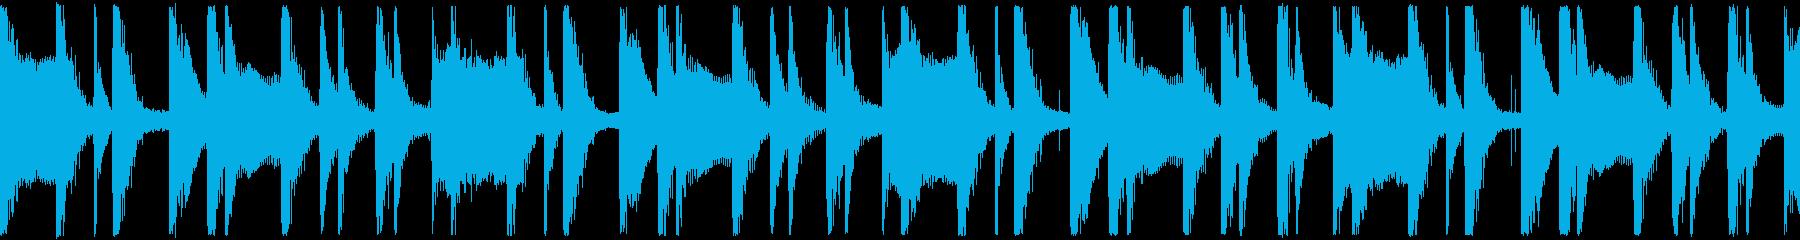 jazz's reproduced waveform